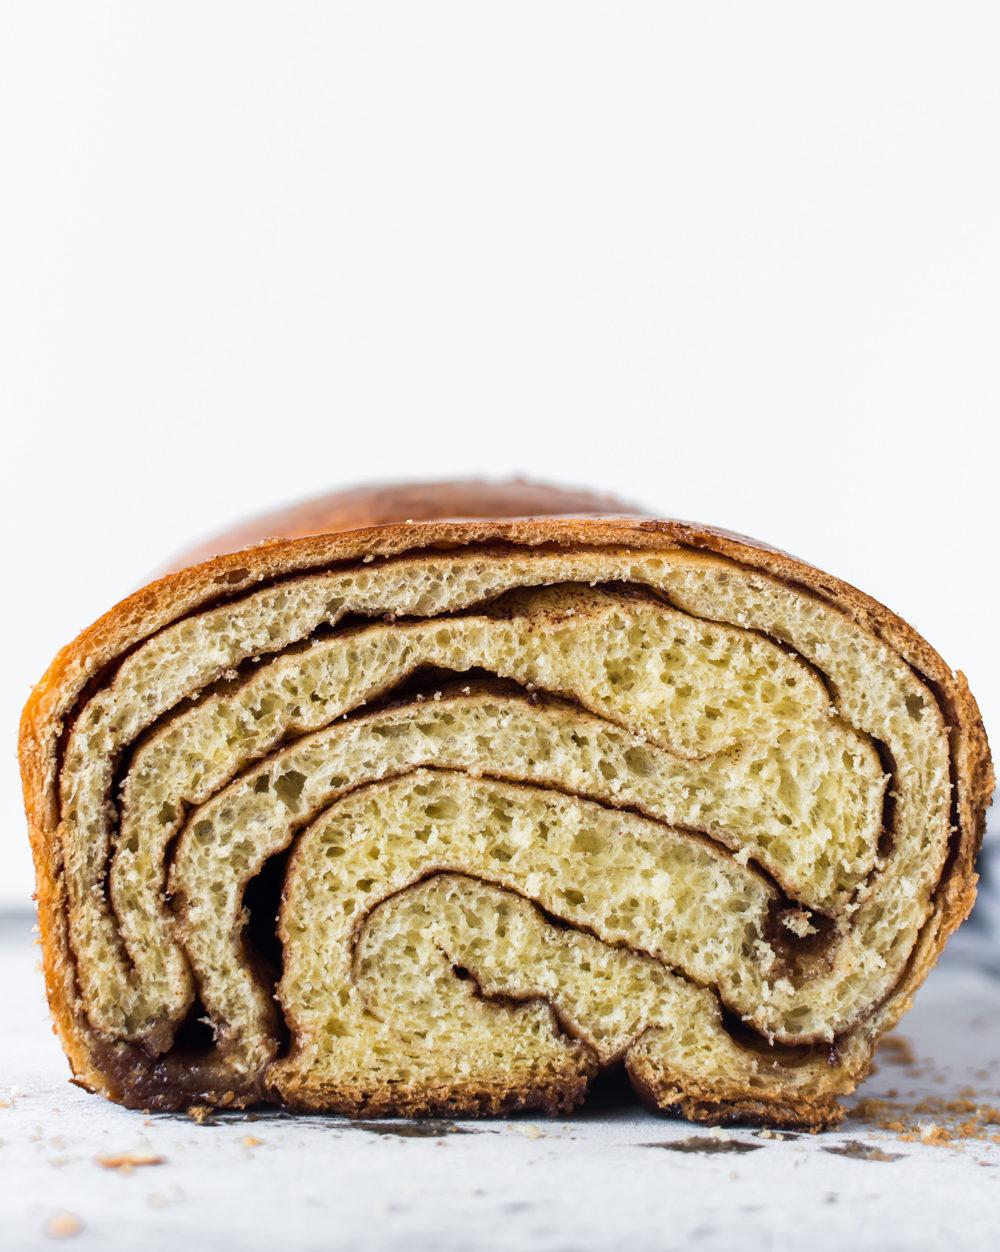 Cinnamon Swirl Yeast Bread With Spice